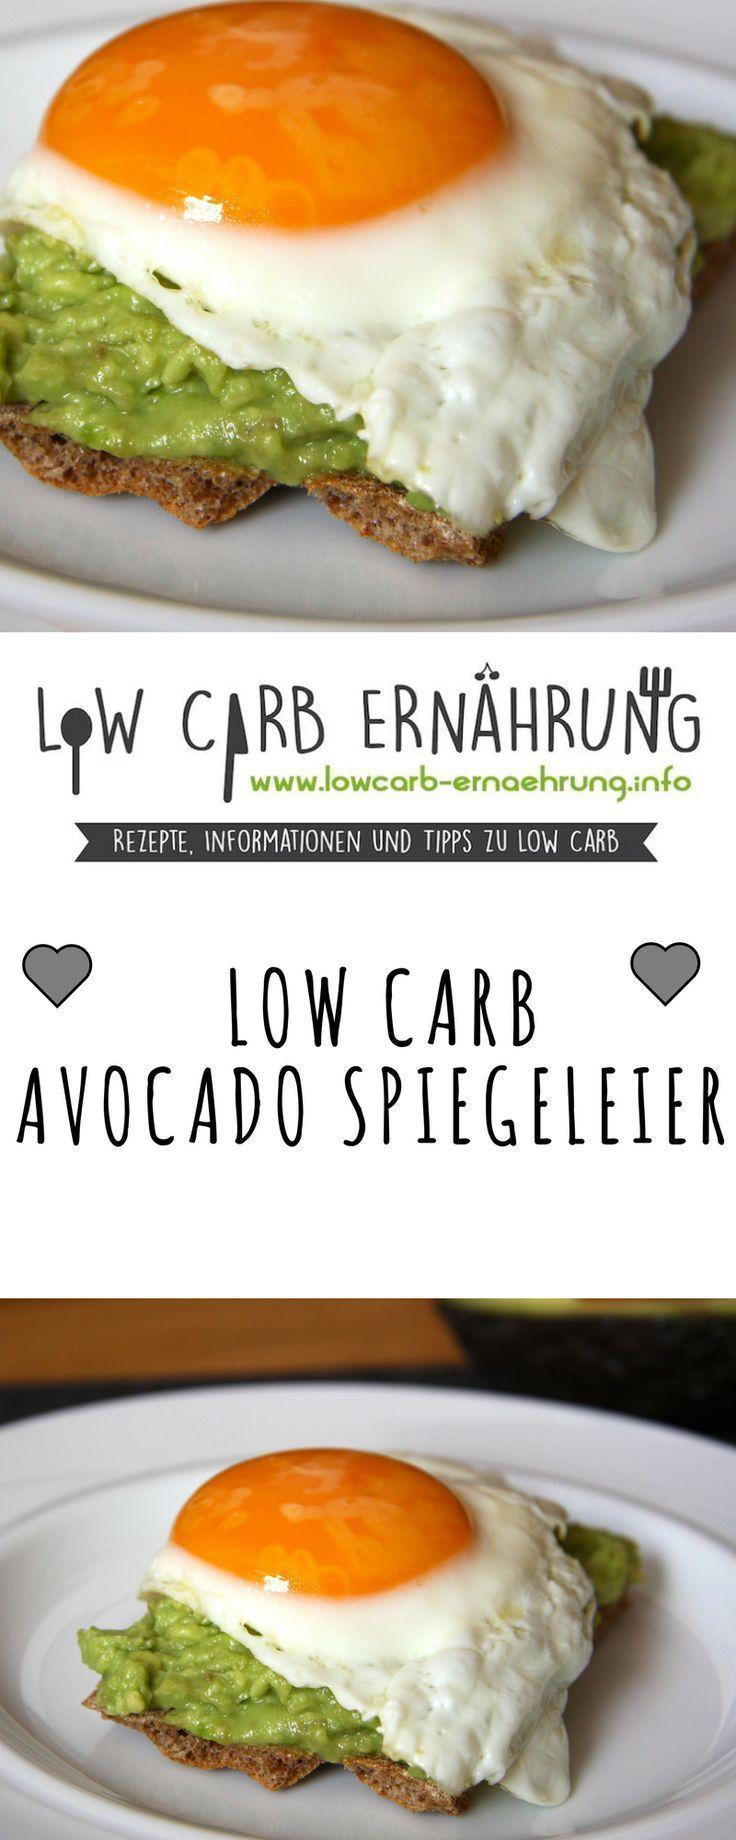 #Hautpflege-Rezepte-Low Carb Rezept für leckere Avocado-Spiegeleier m…  #Haut…